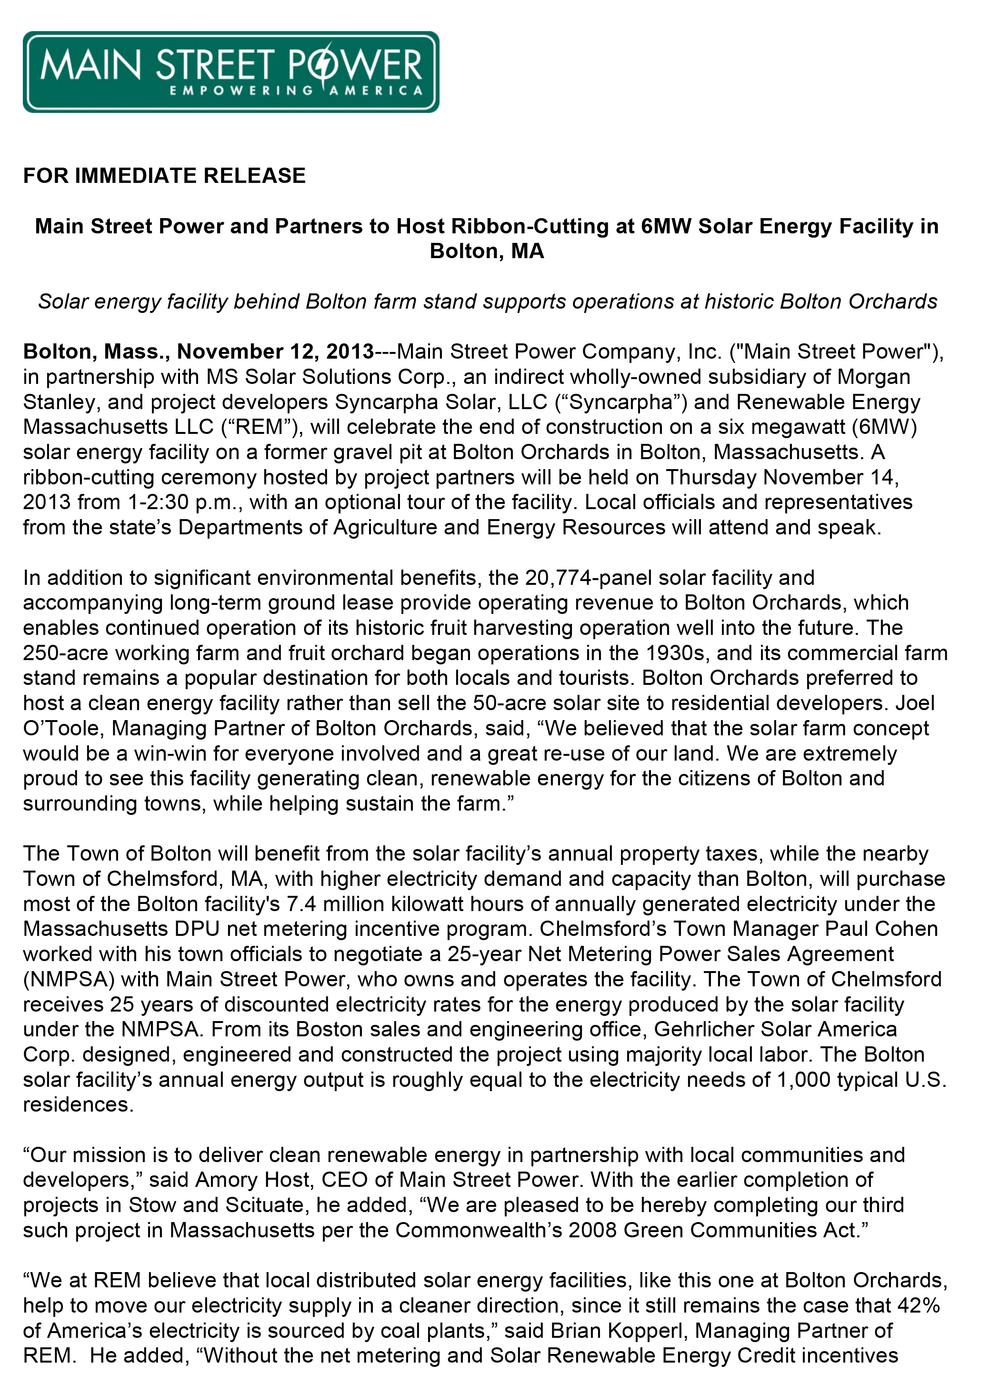 Bolton-Press-Release-11.12-- 1.jpg